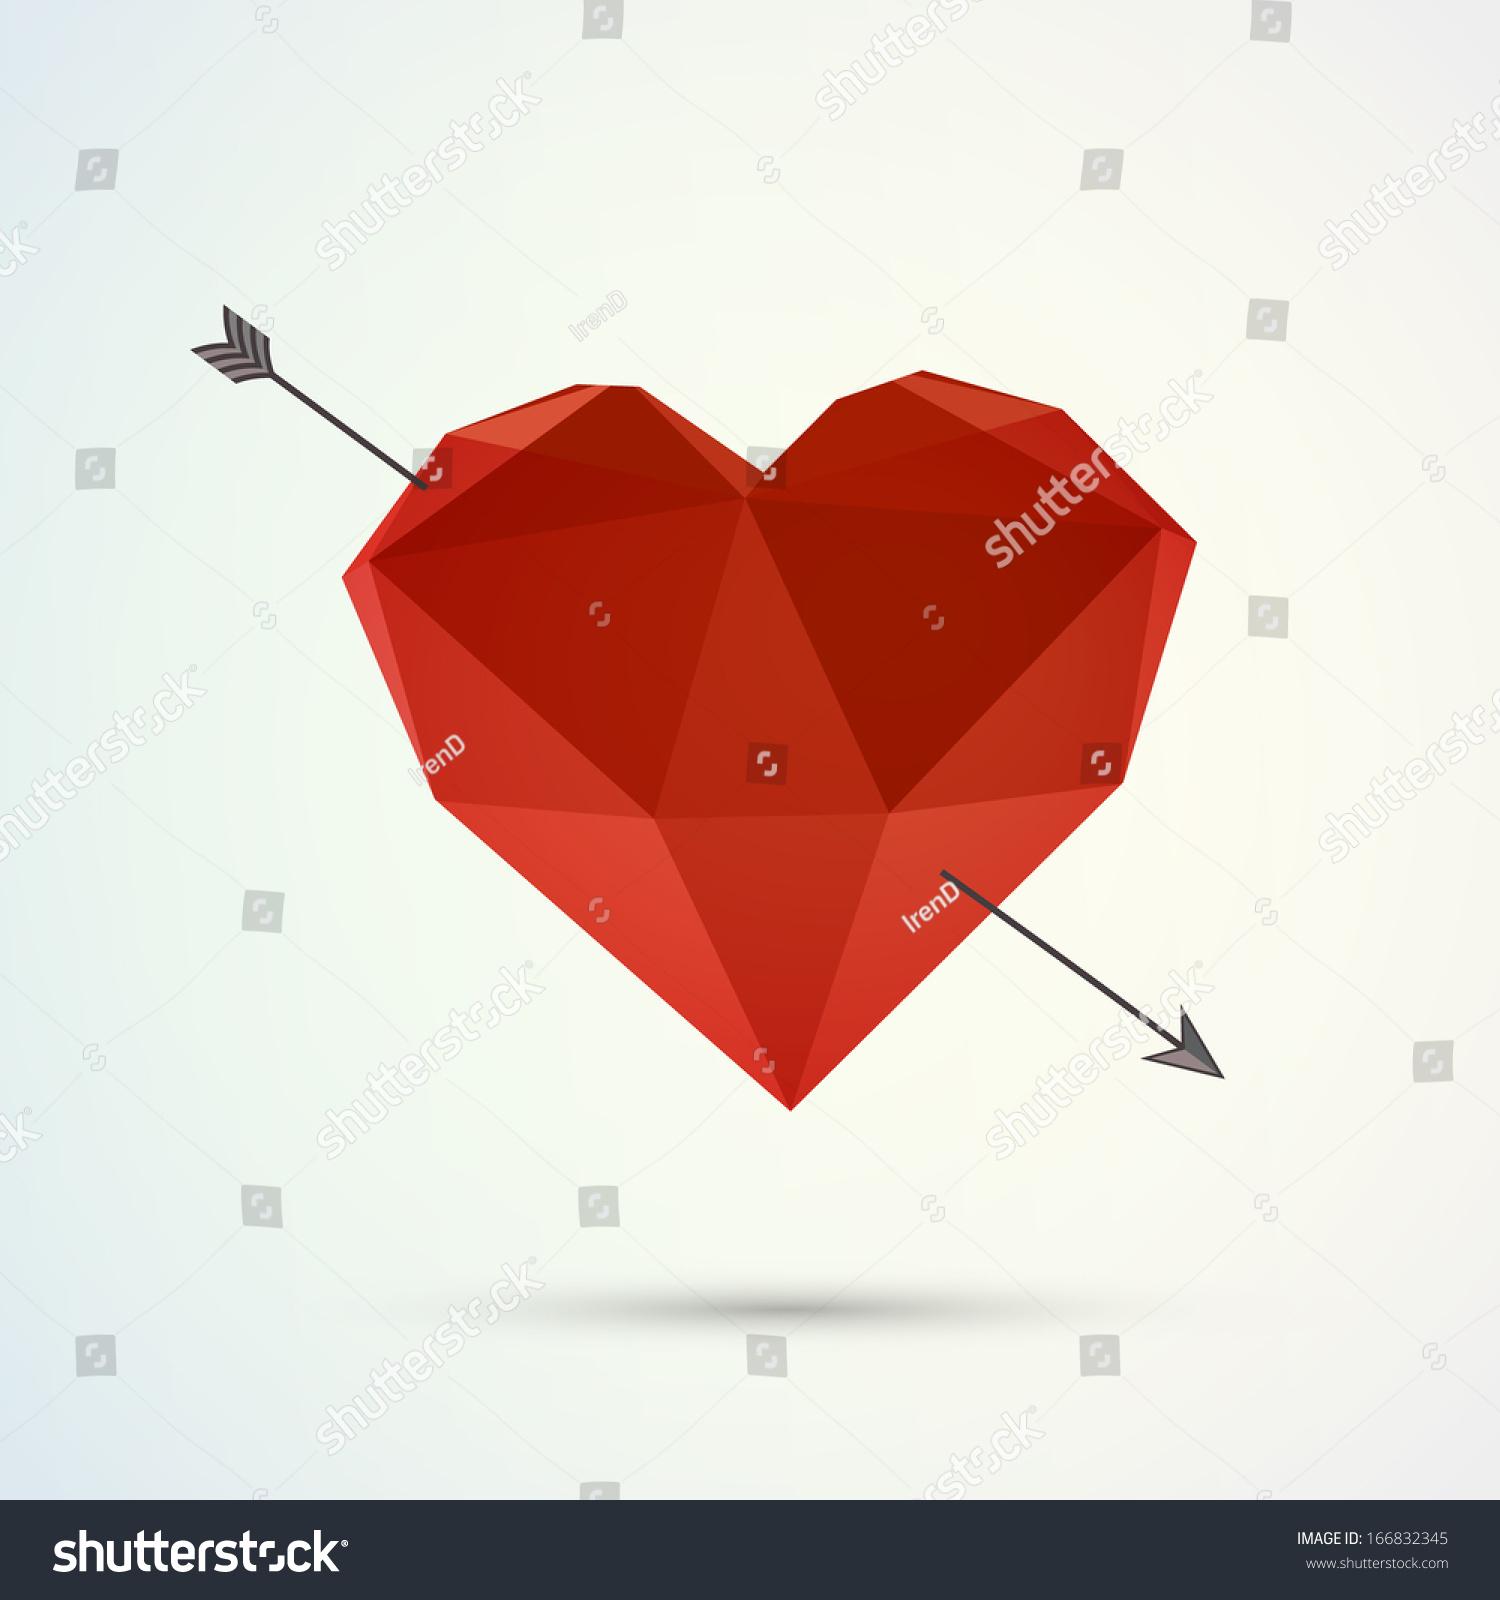 Hover 3d origami heart design arrow stock vector 166832345 hover 3d origami heart design with arrow and shadow eps 10 vector illustration jeuxipadfo Gallery